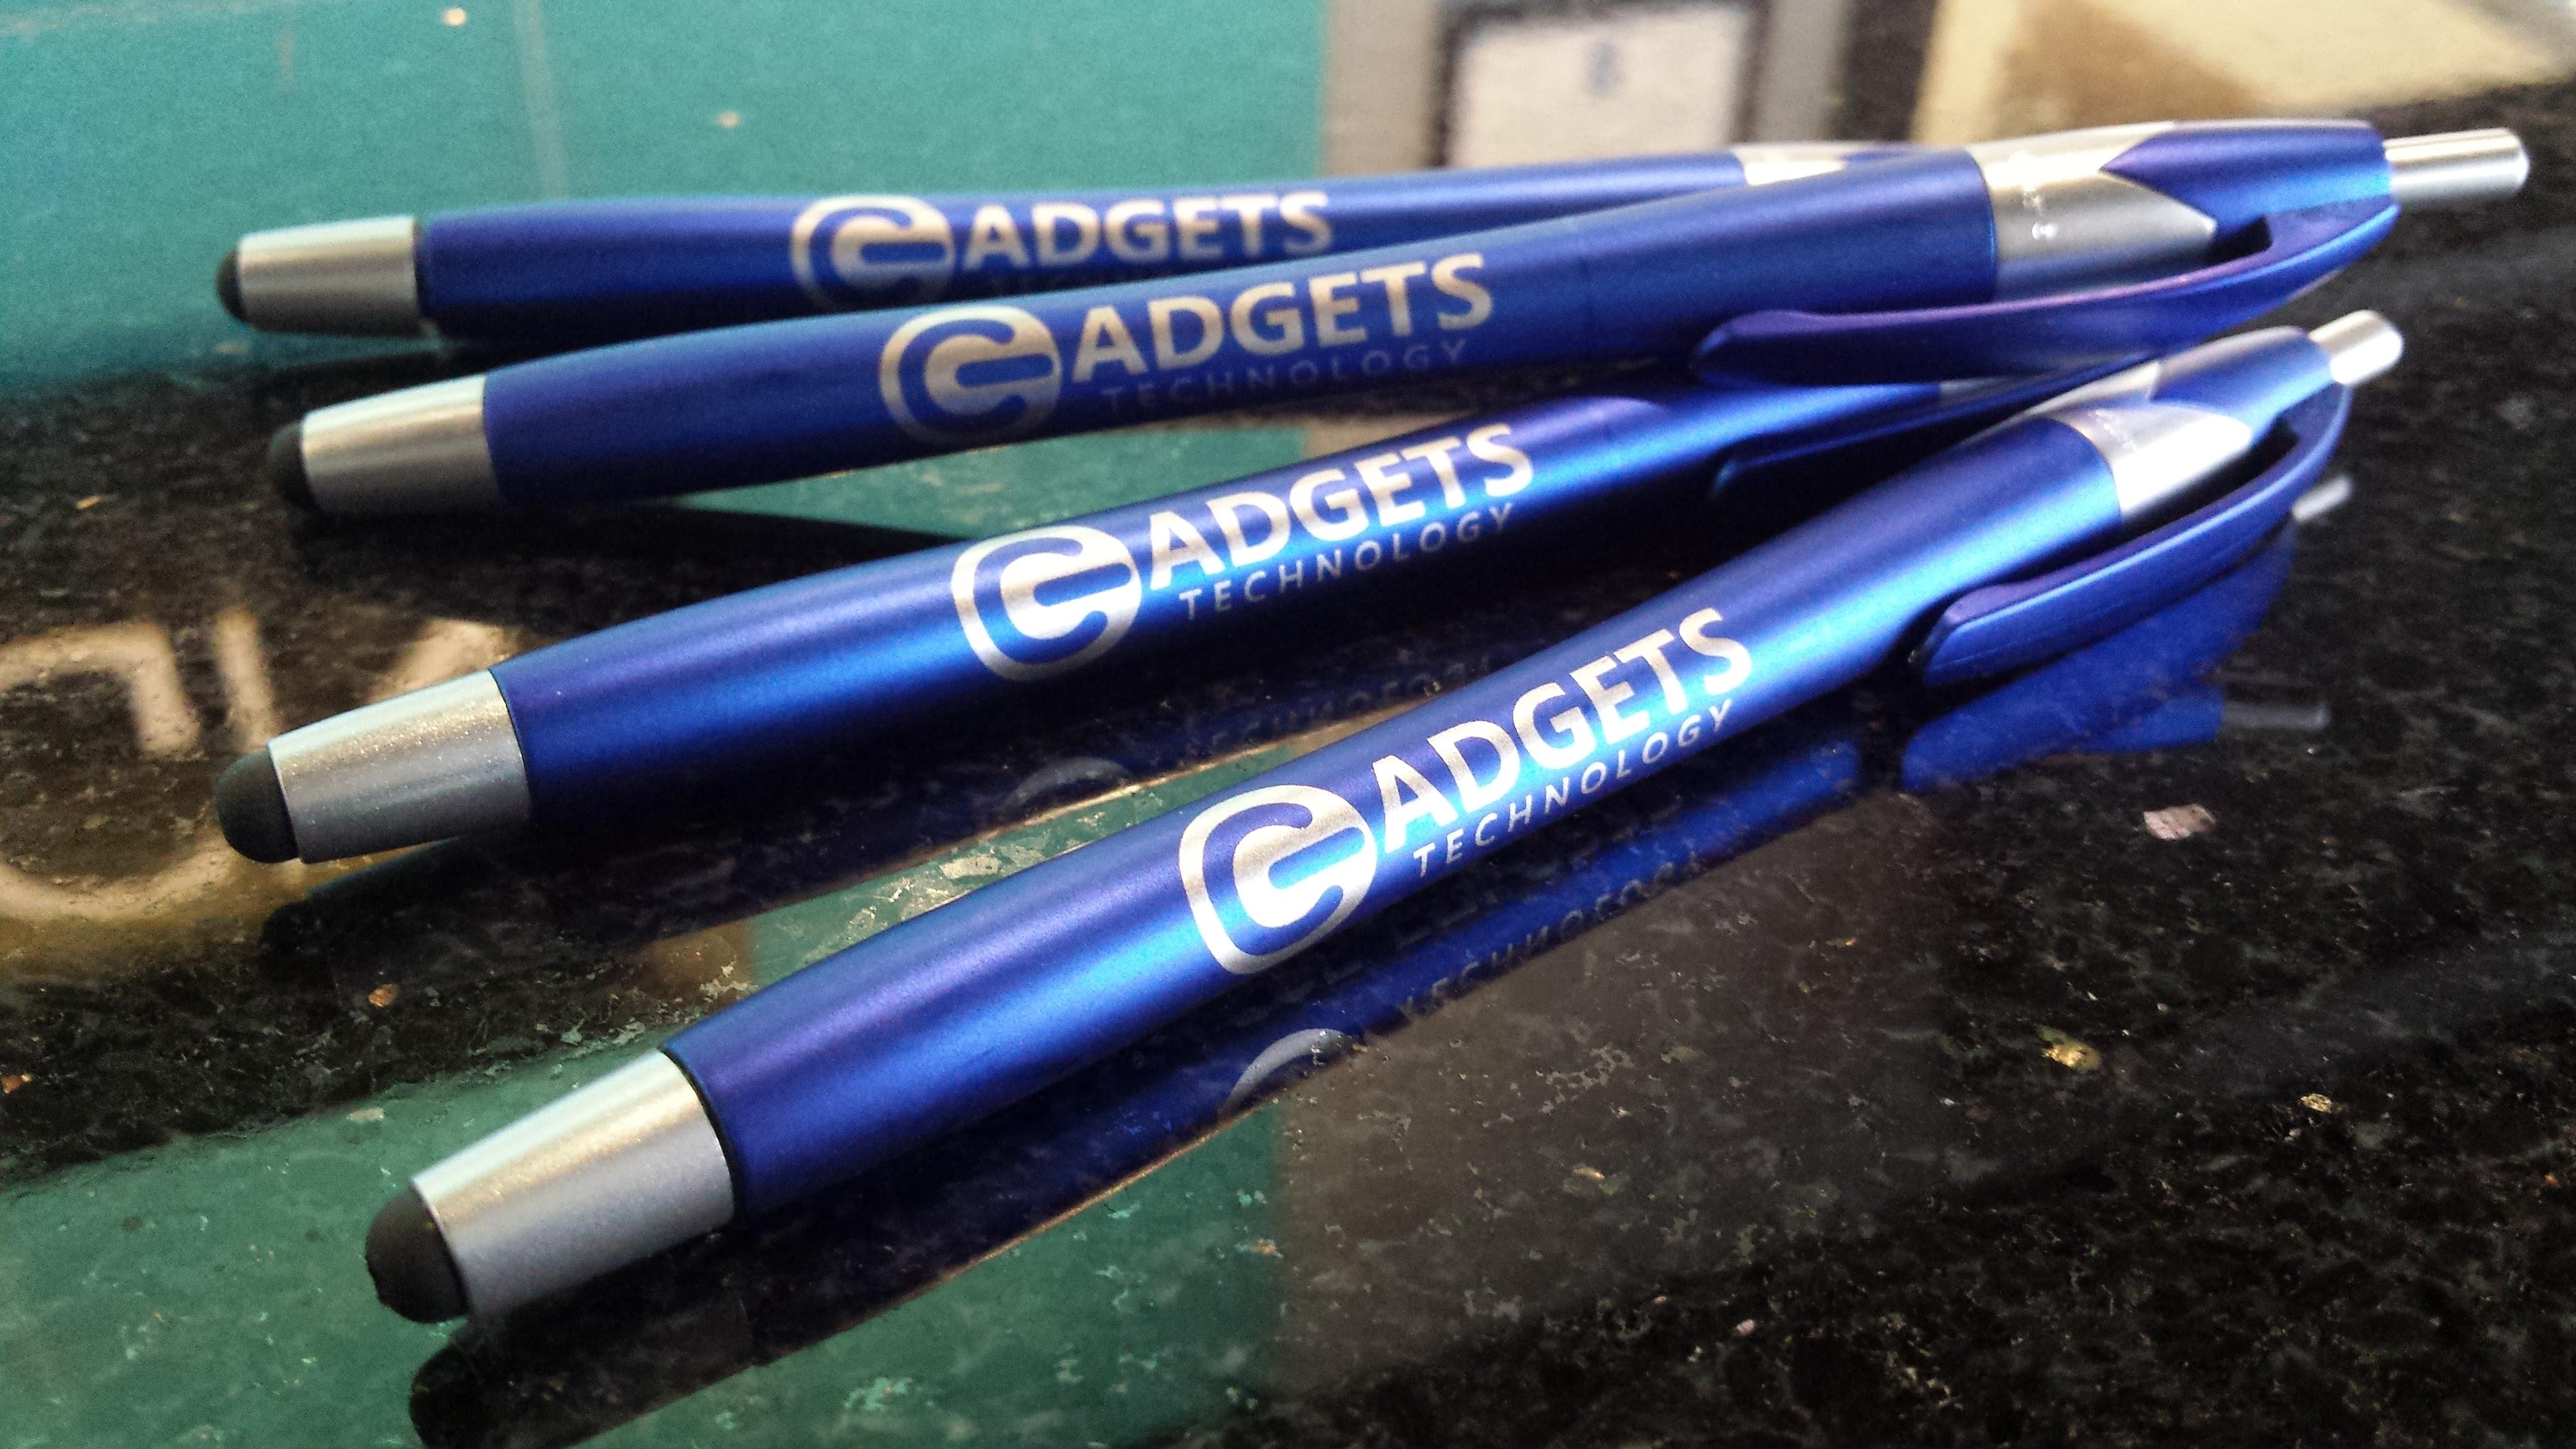 Stylus Pens